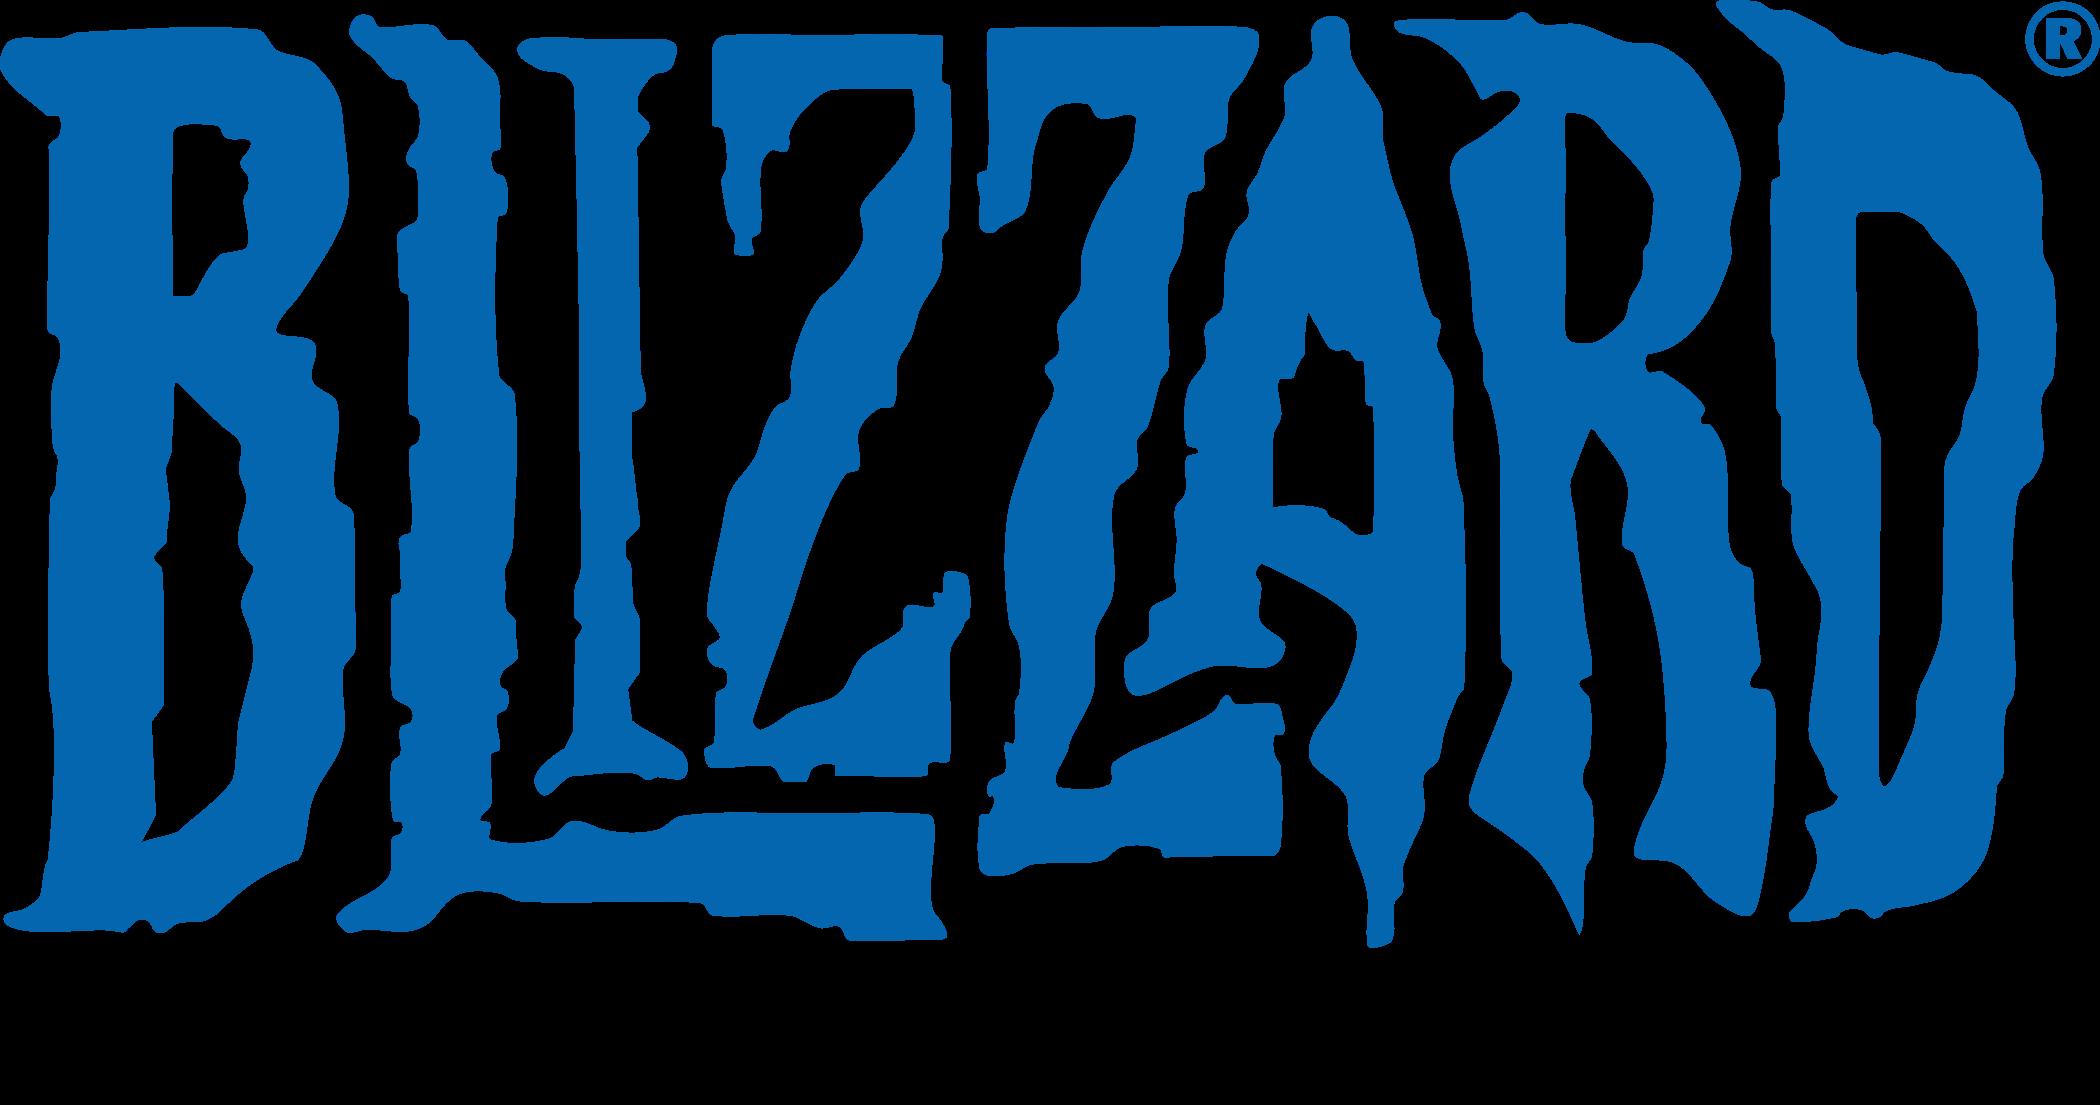 blizzard logo 2 - Blizzard Entertainment Logo